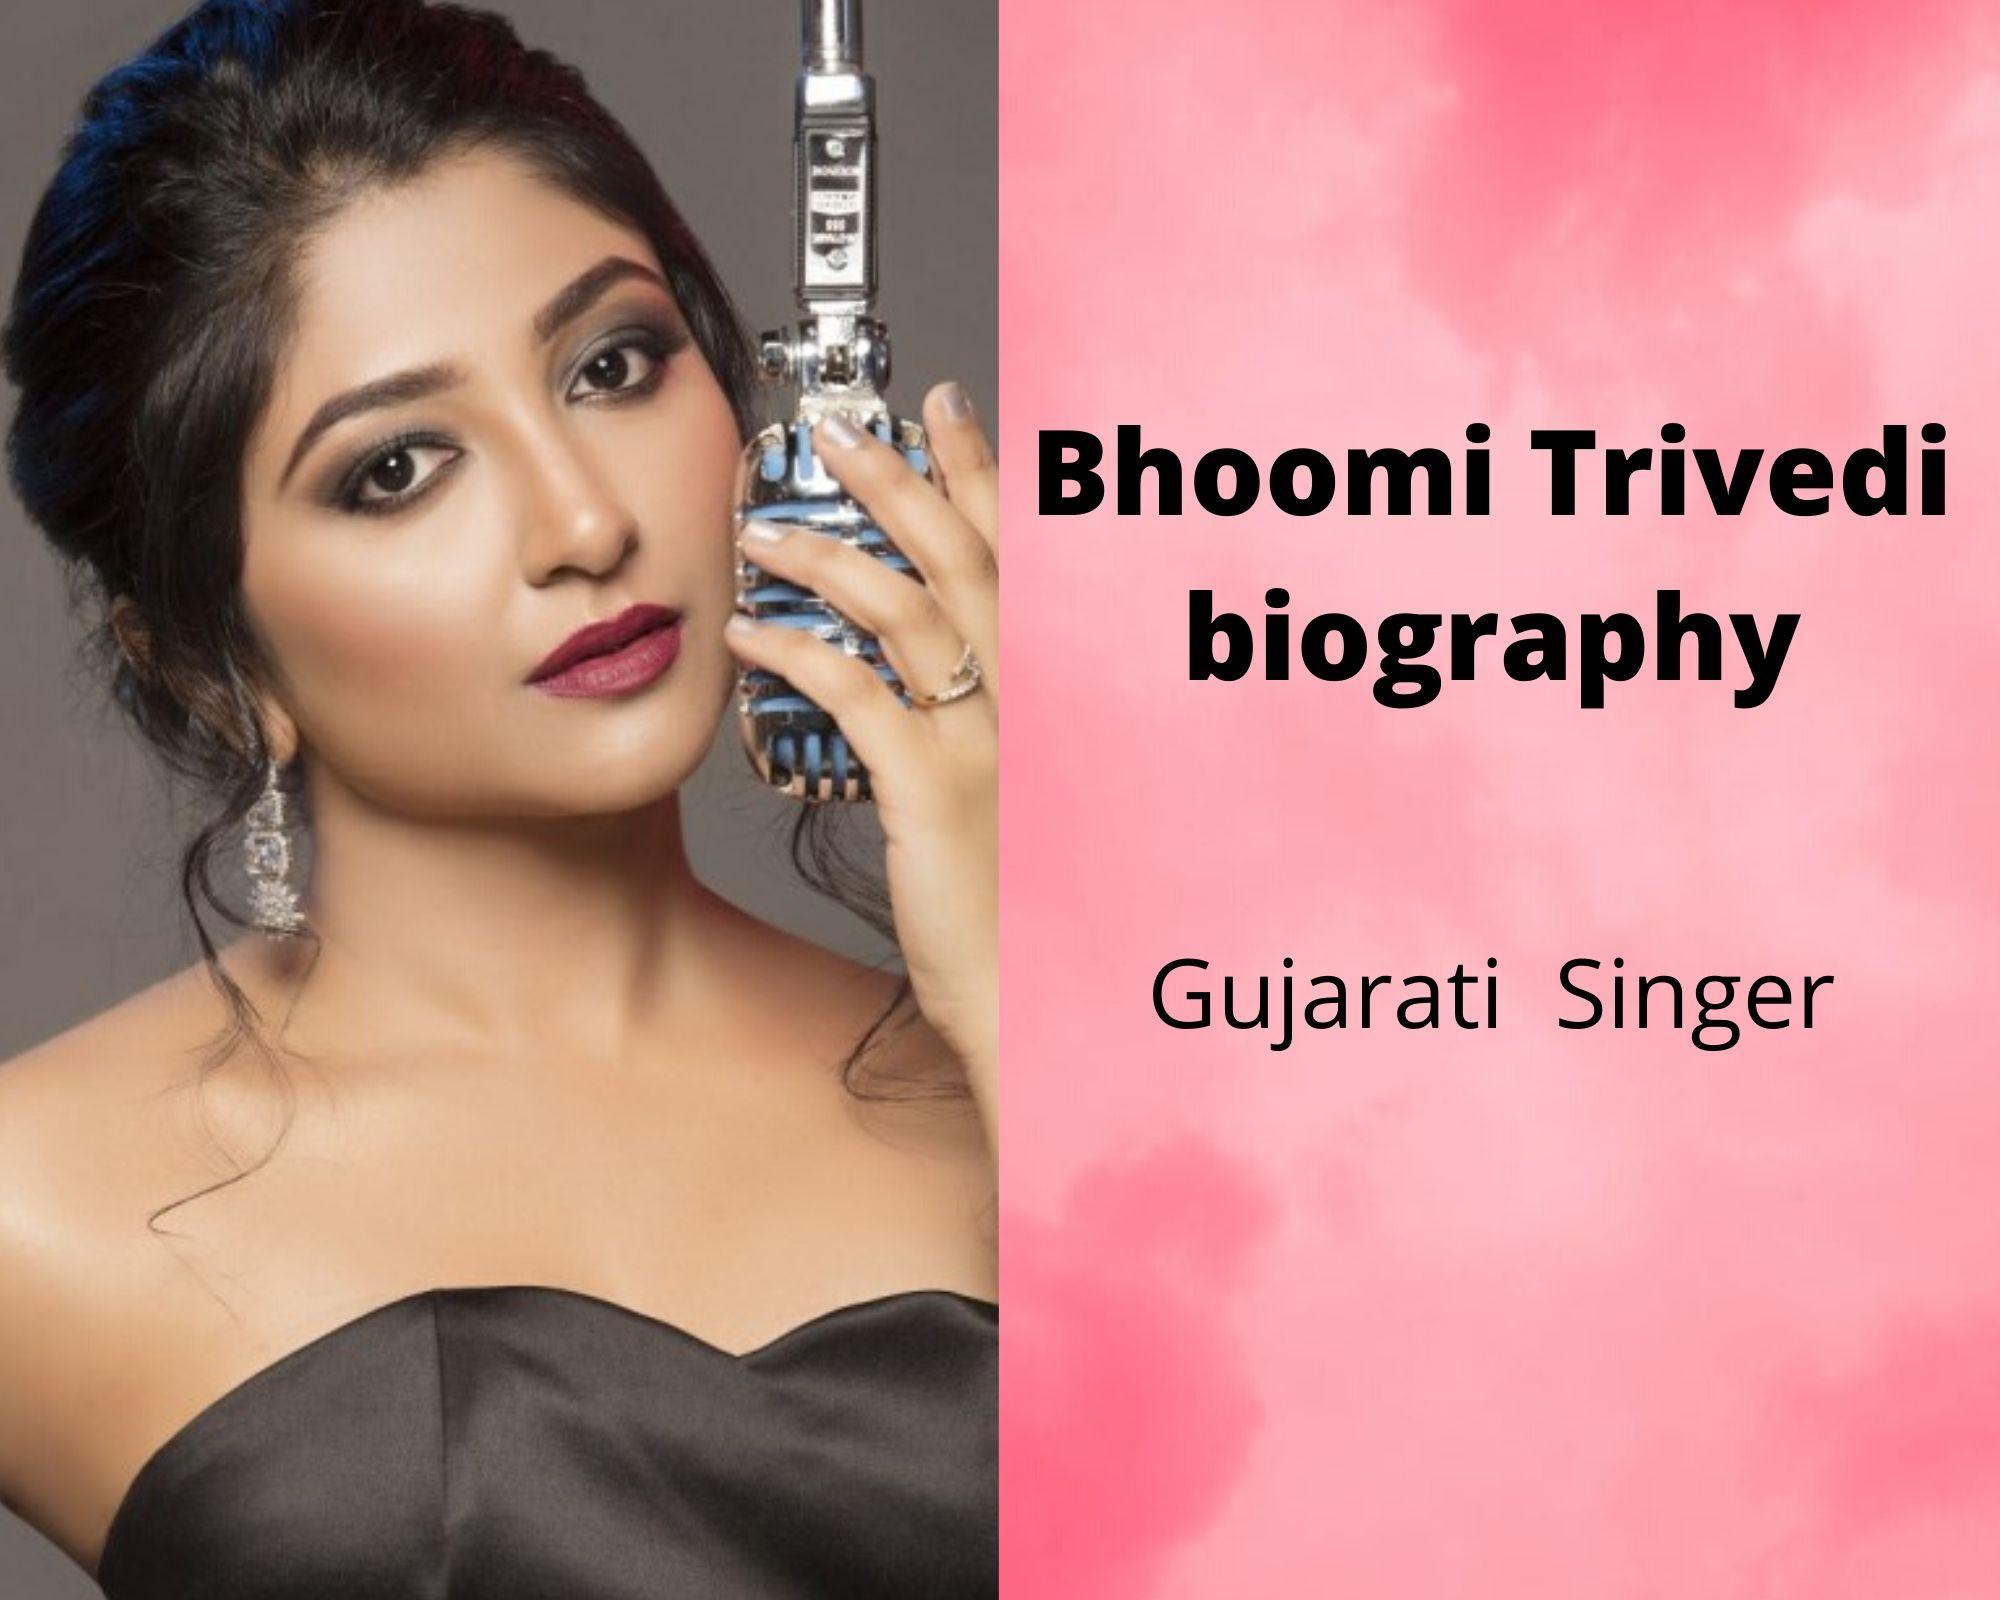 Bhoomi-Trivedi-biography